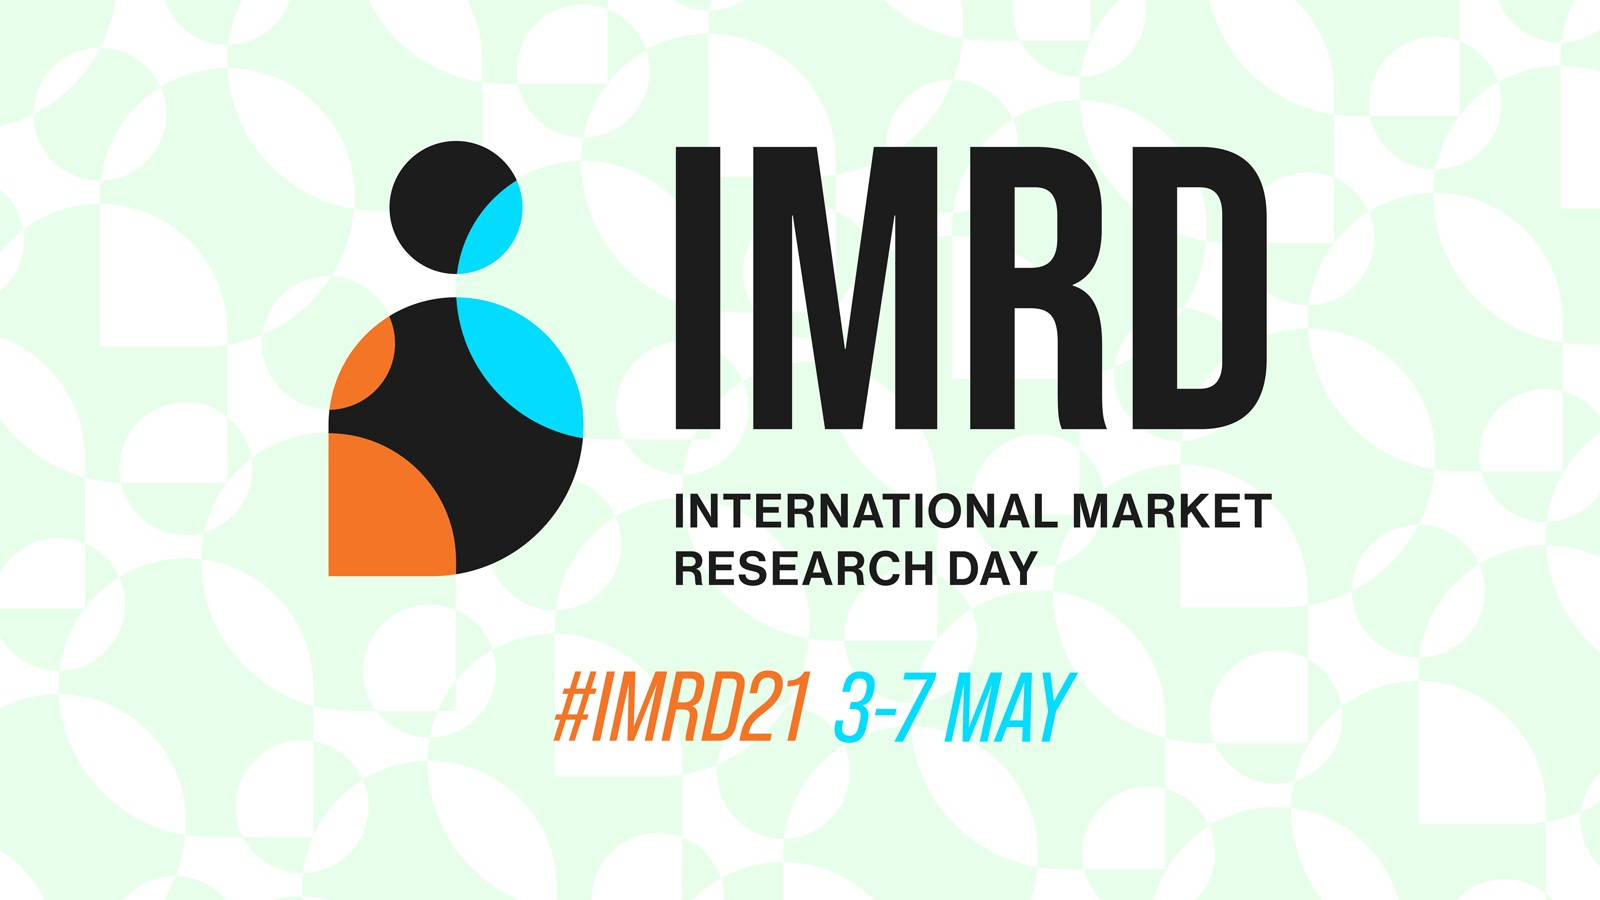 International Market Research Day 2021 (IMRD)